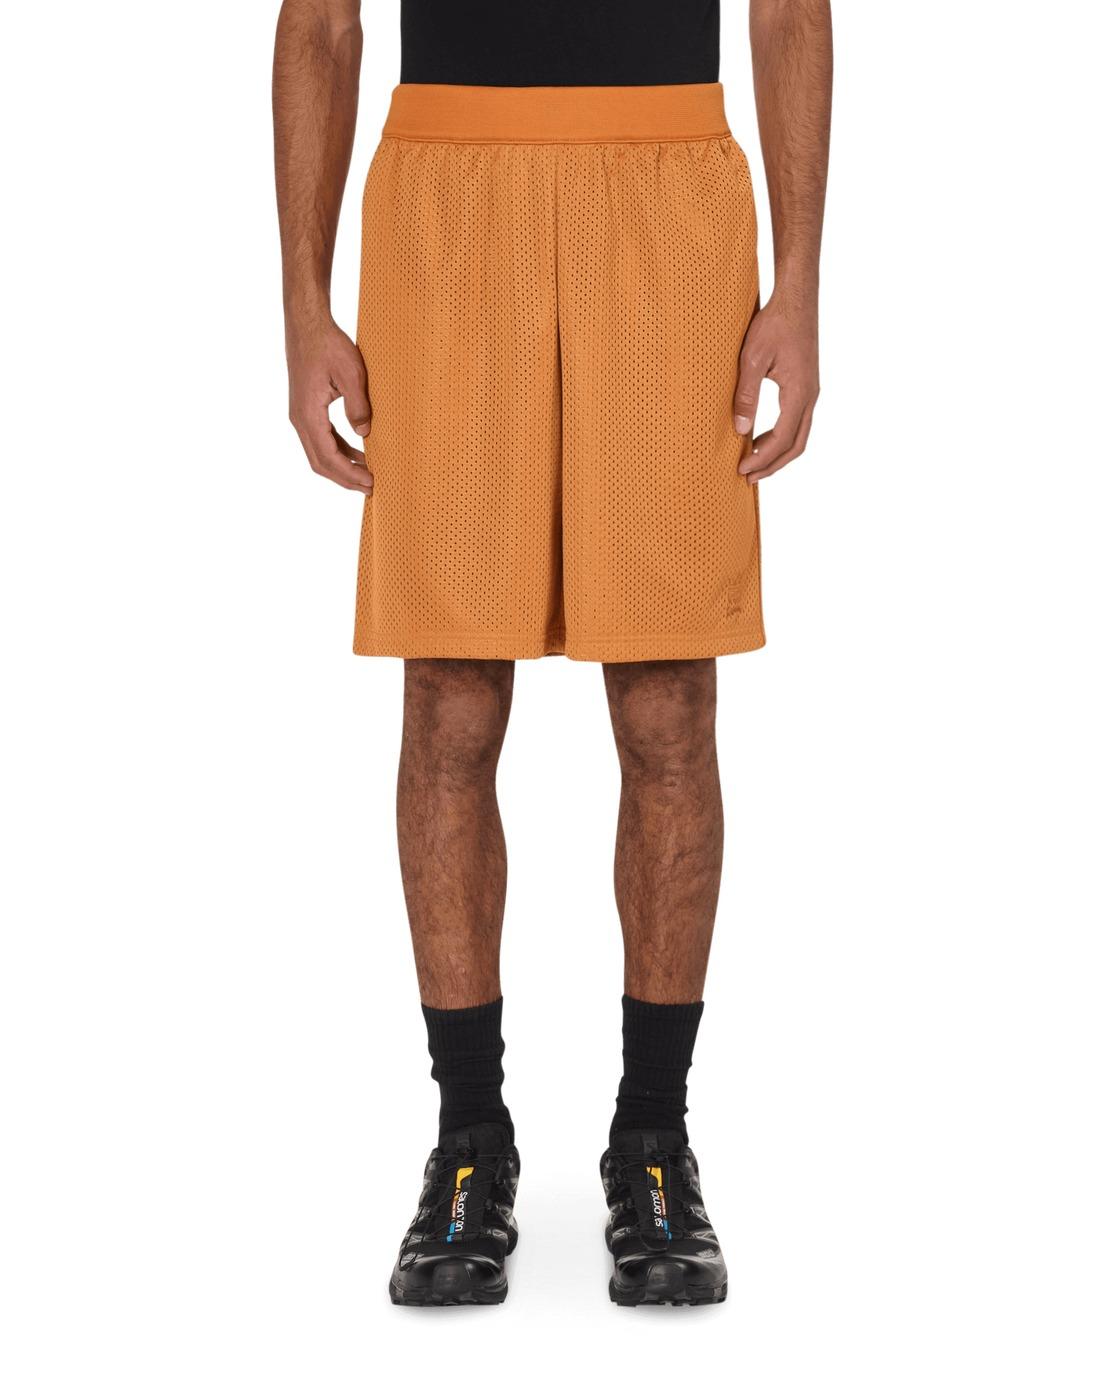 Adidas Originals Jonah Hill Mesh Shorts Tech Copper